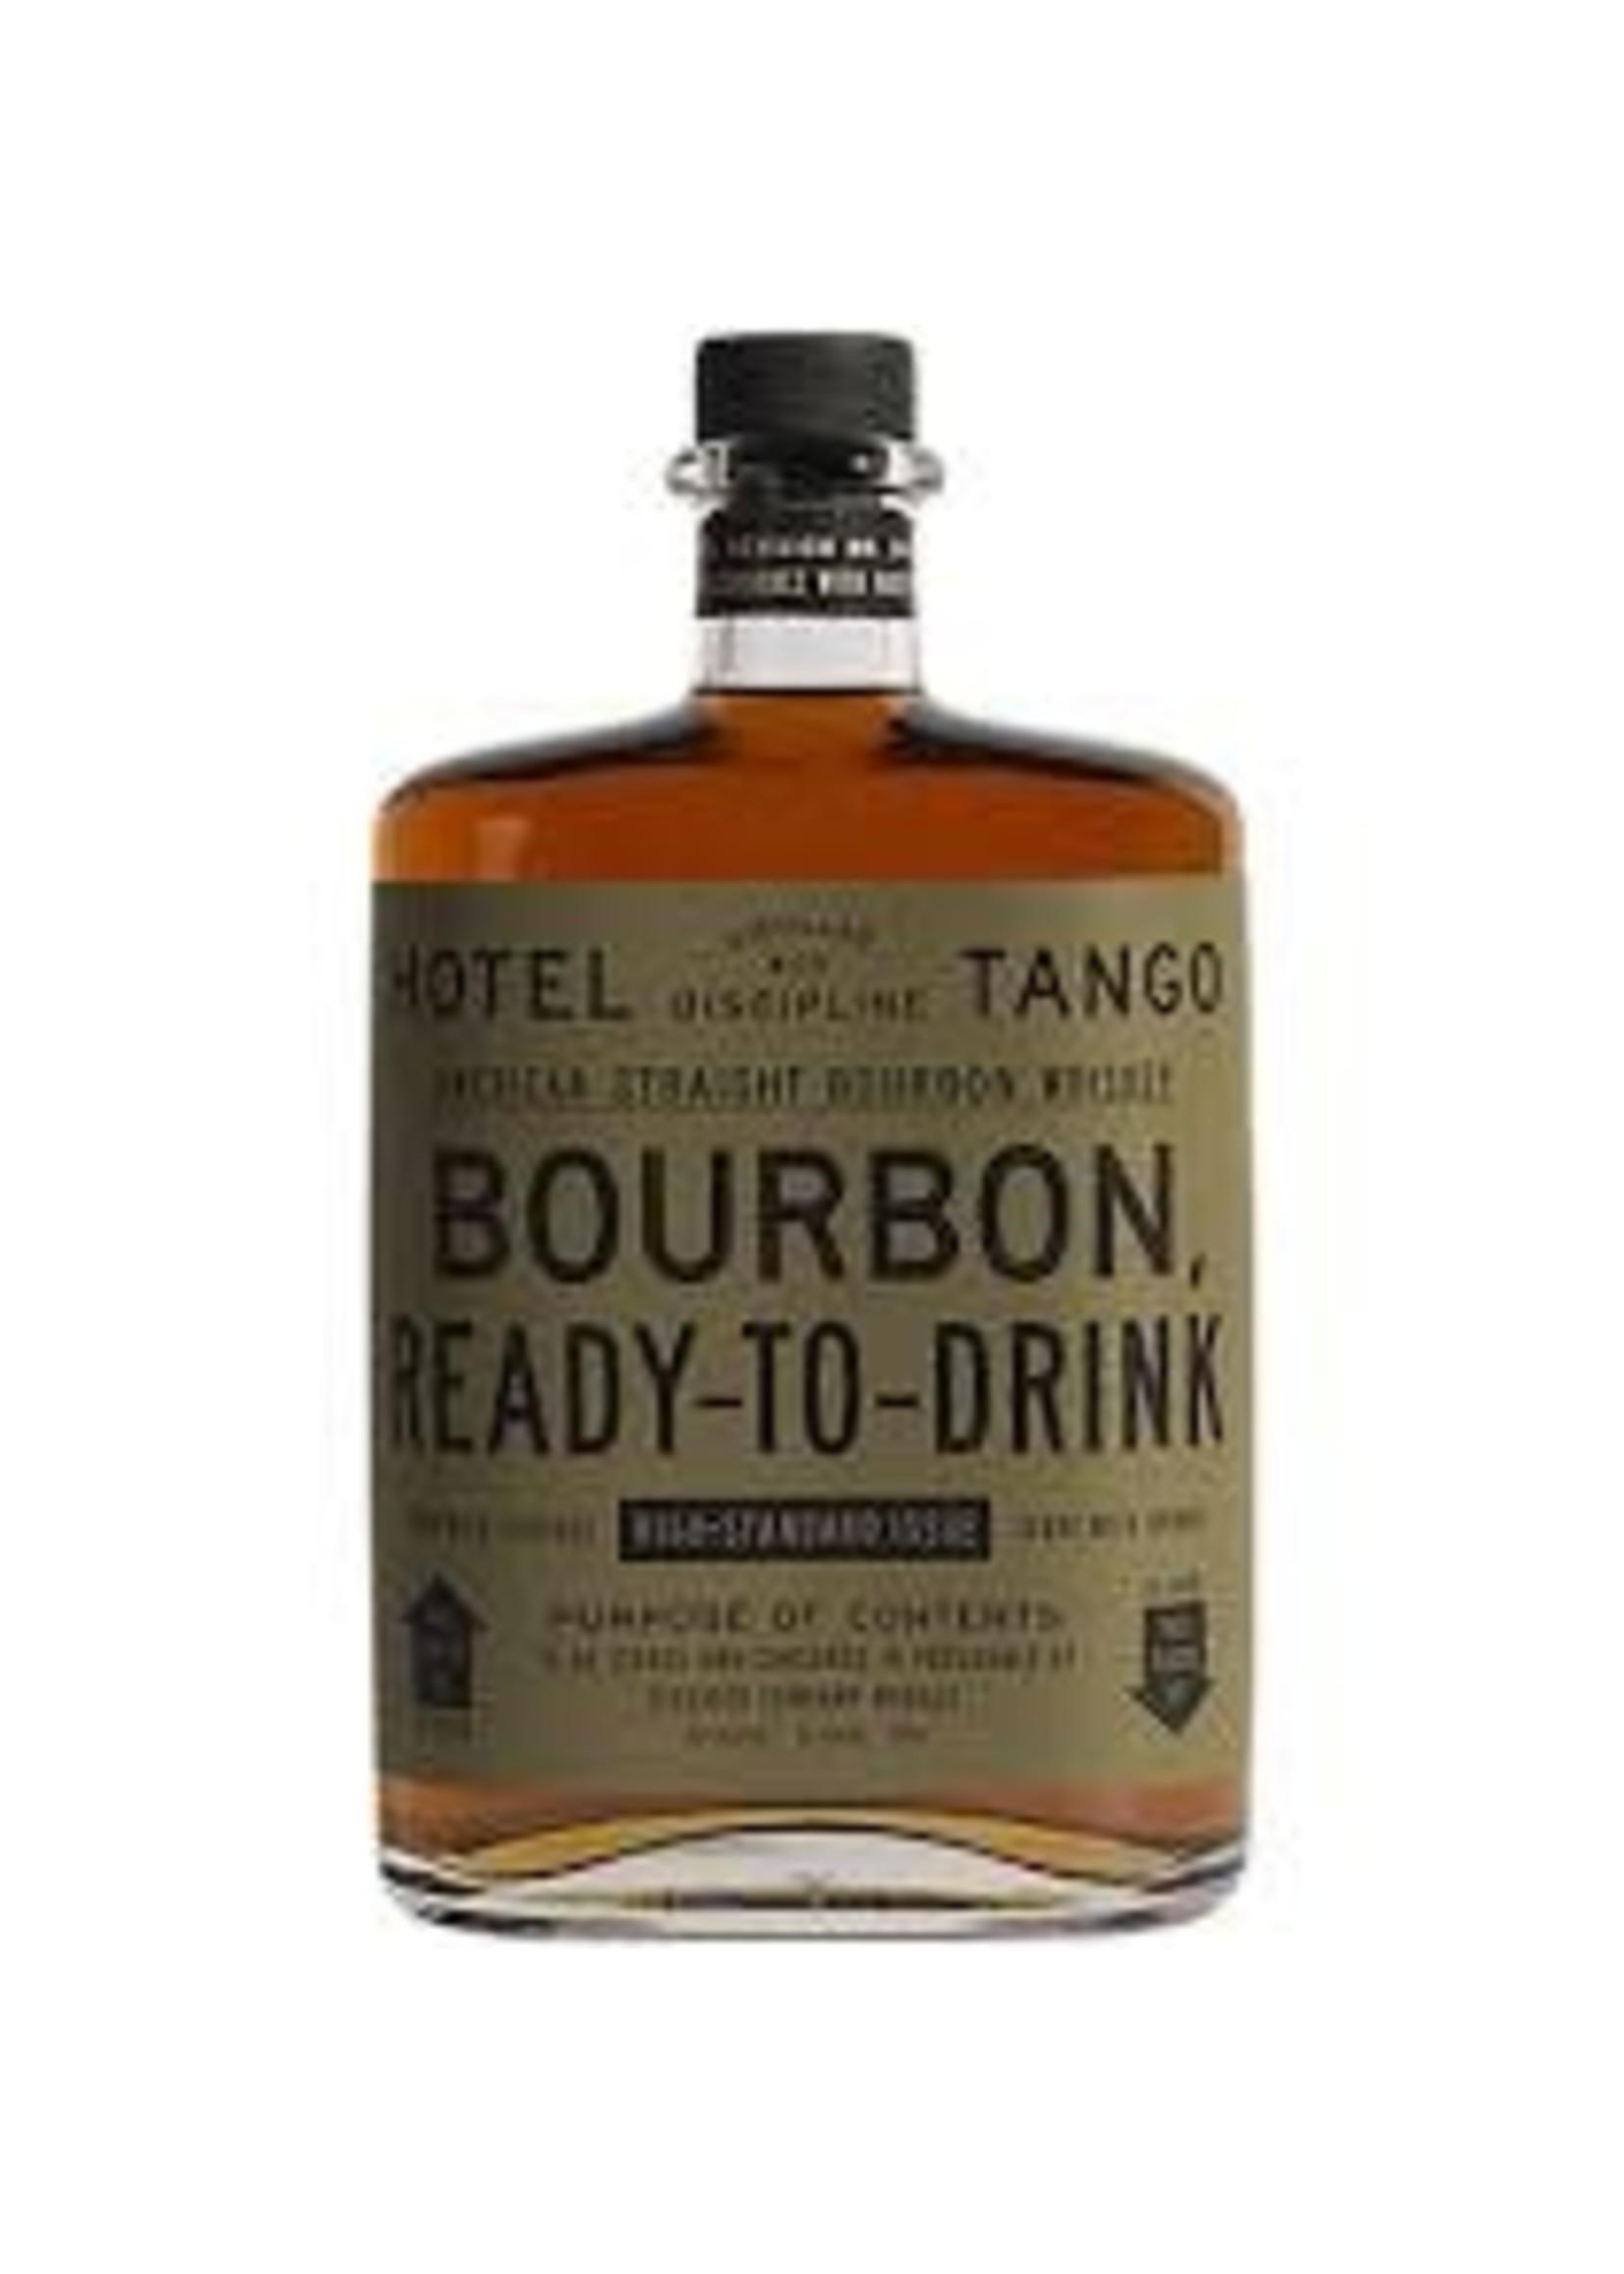 Hotel Tango American Straight Bourbon Whiskey 750ml